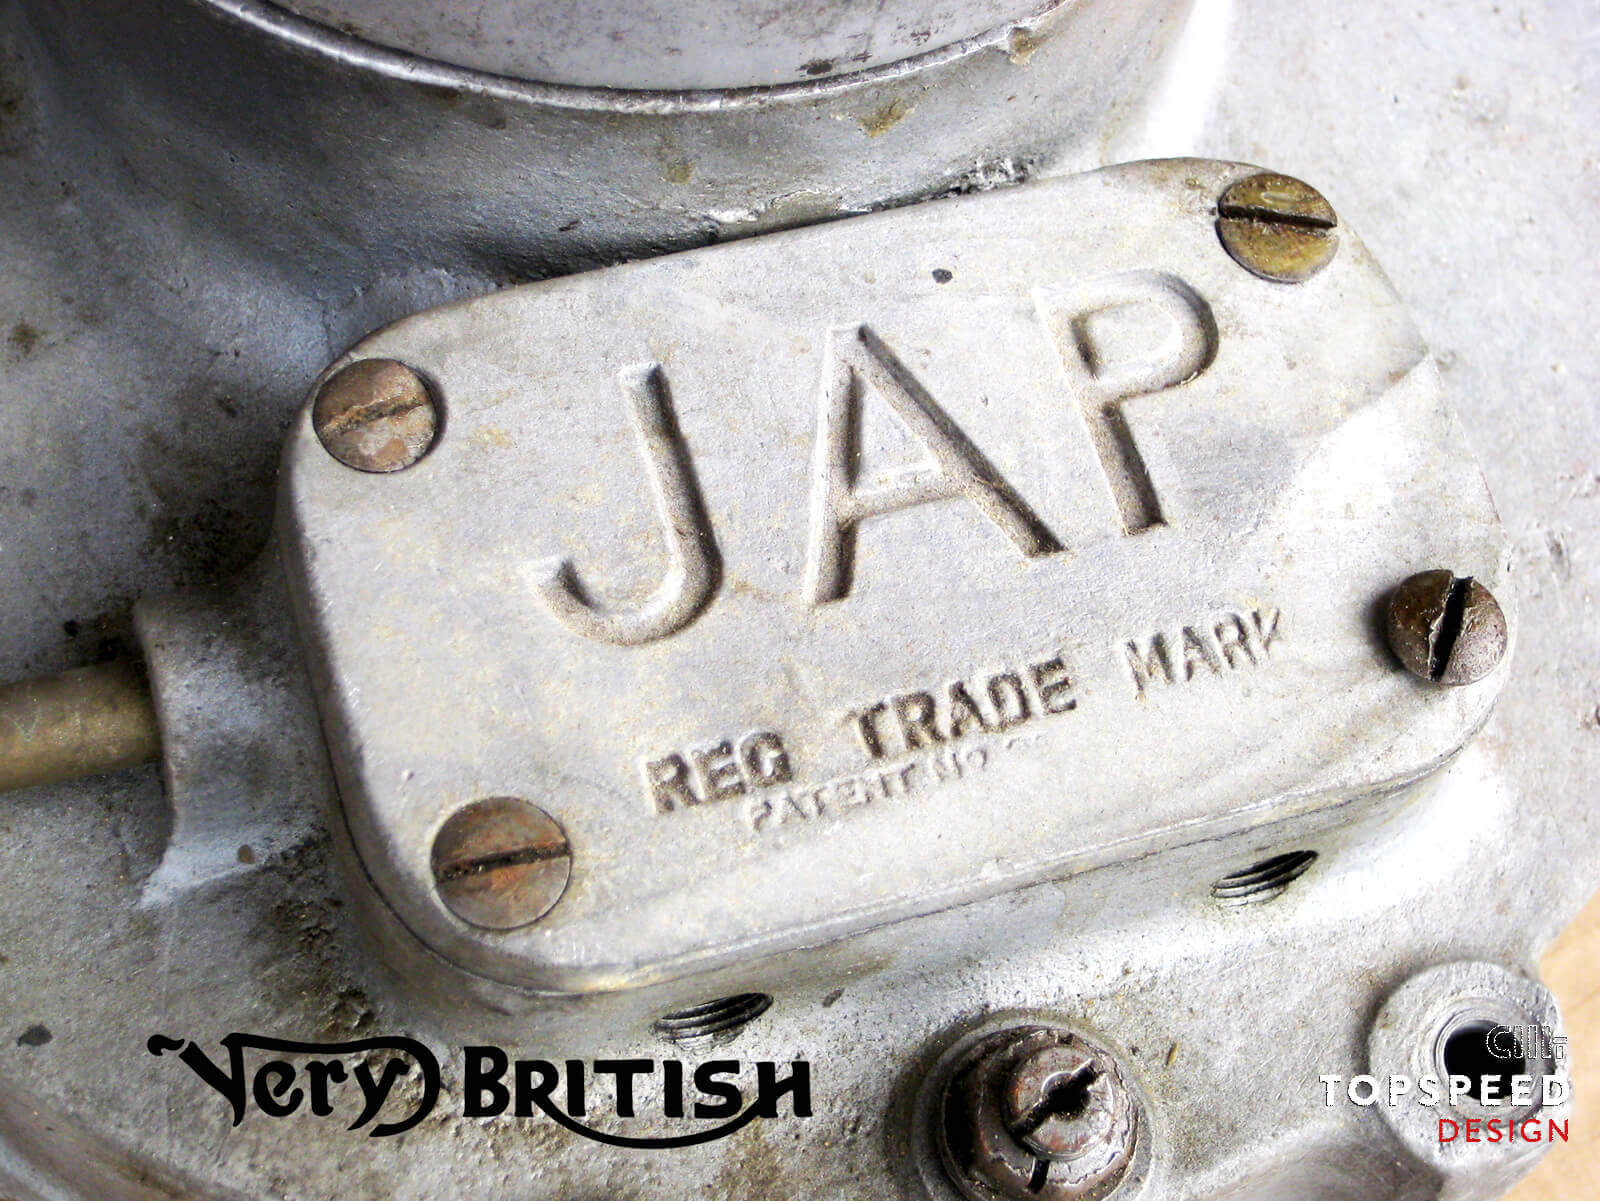 Very British...do you like it? JAP | Topspeed-Design by Bernhard Schmidt